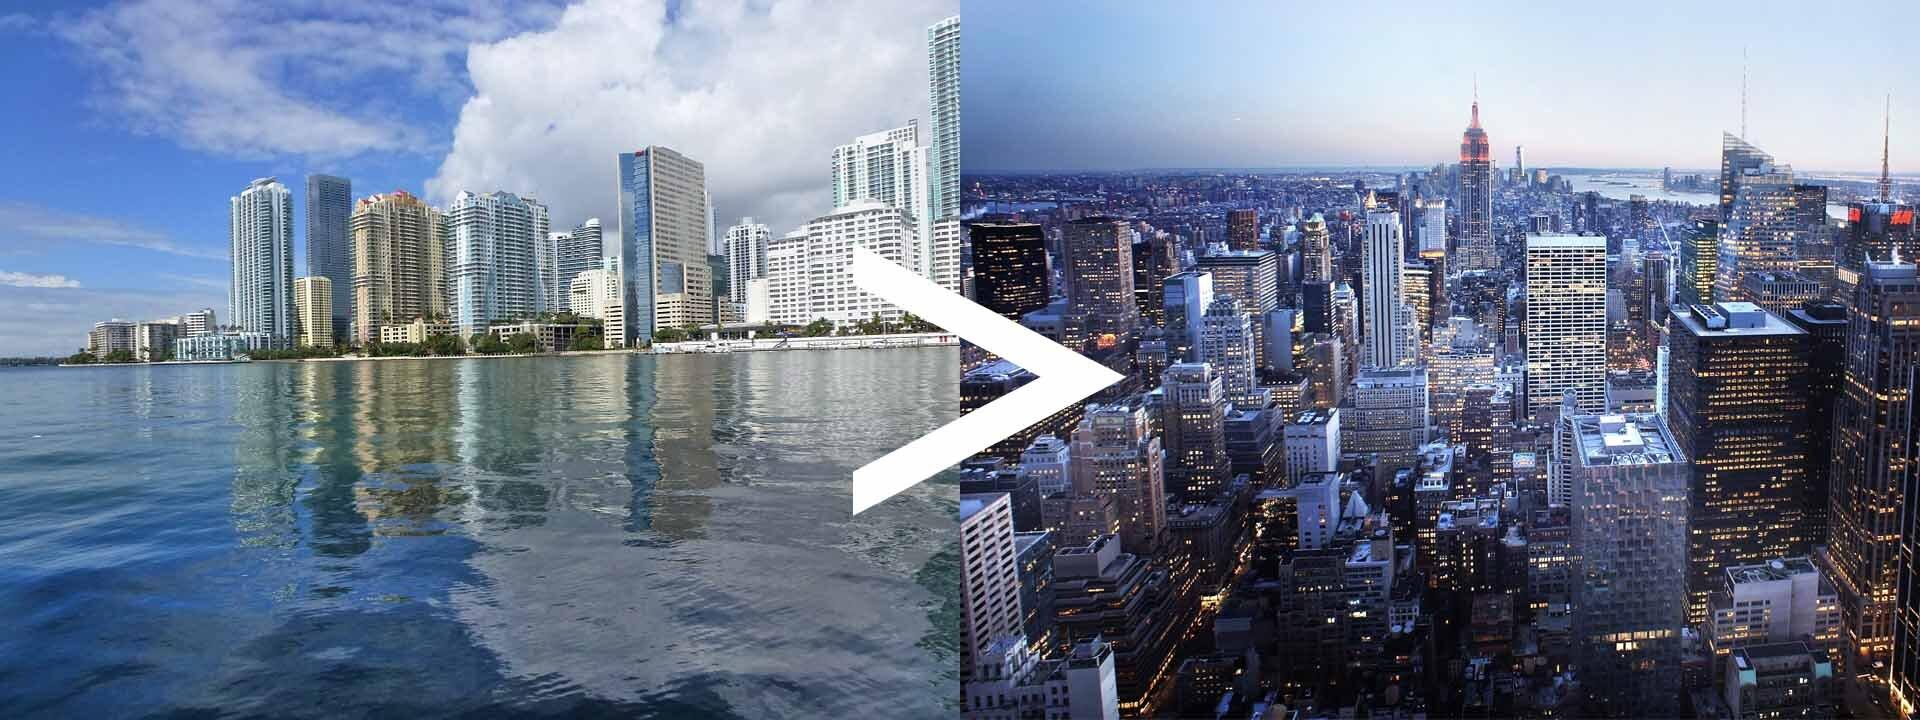 Florida to New York Auto Transport